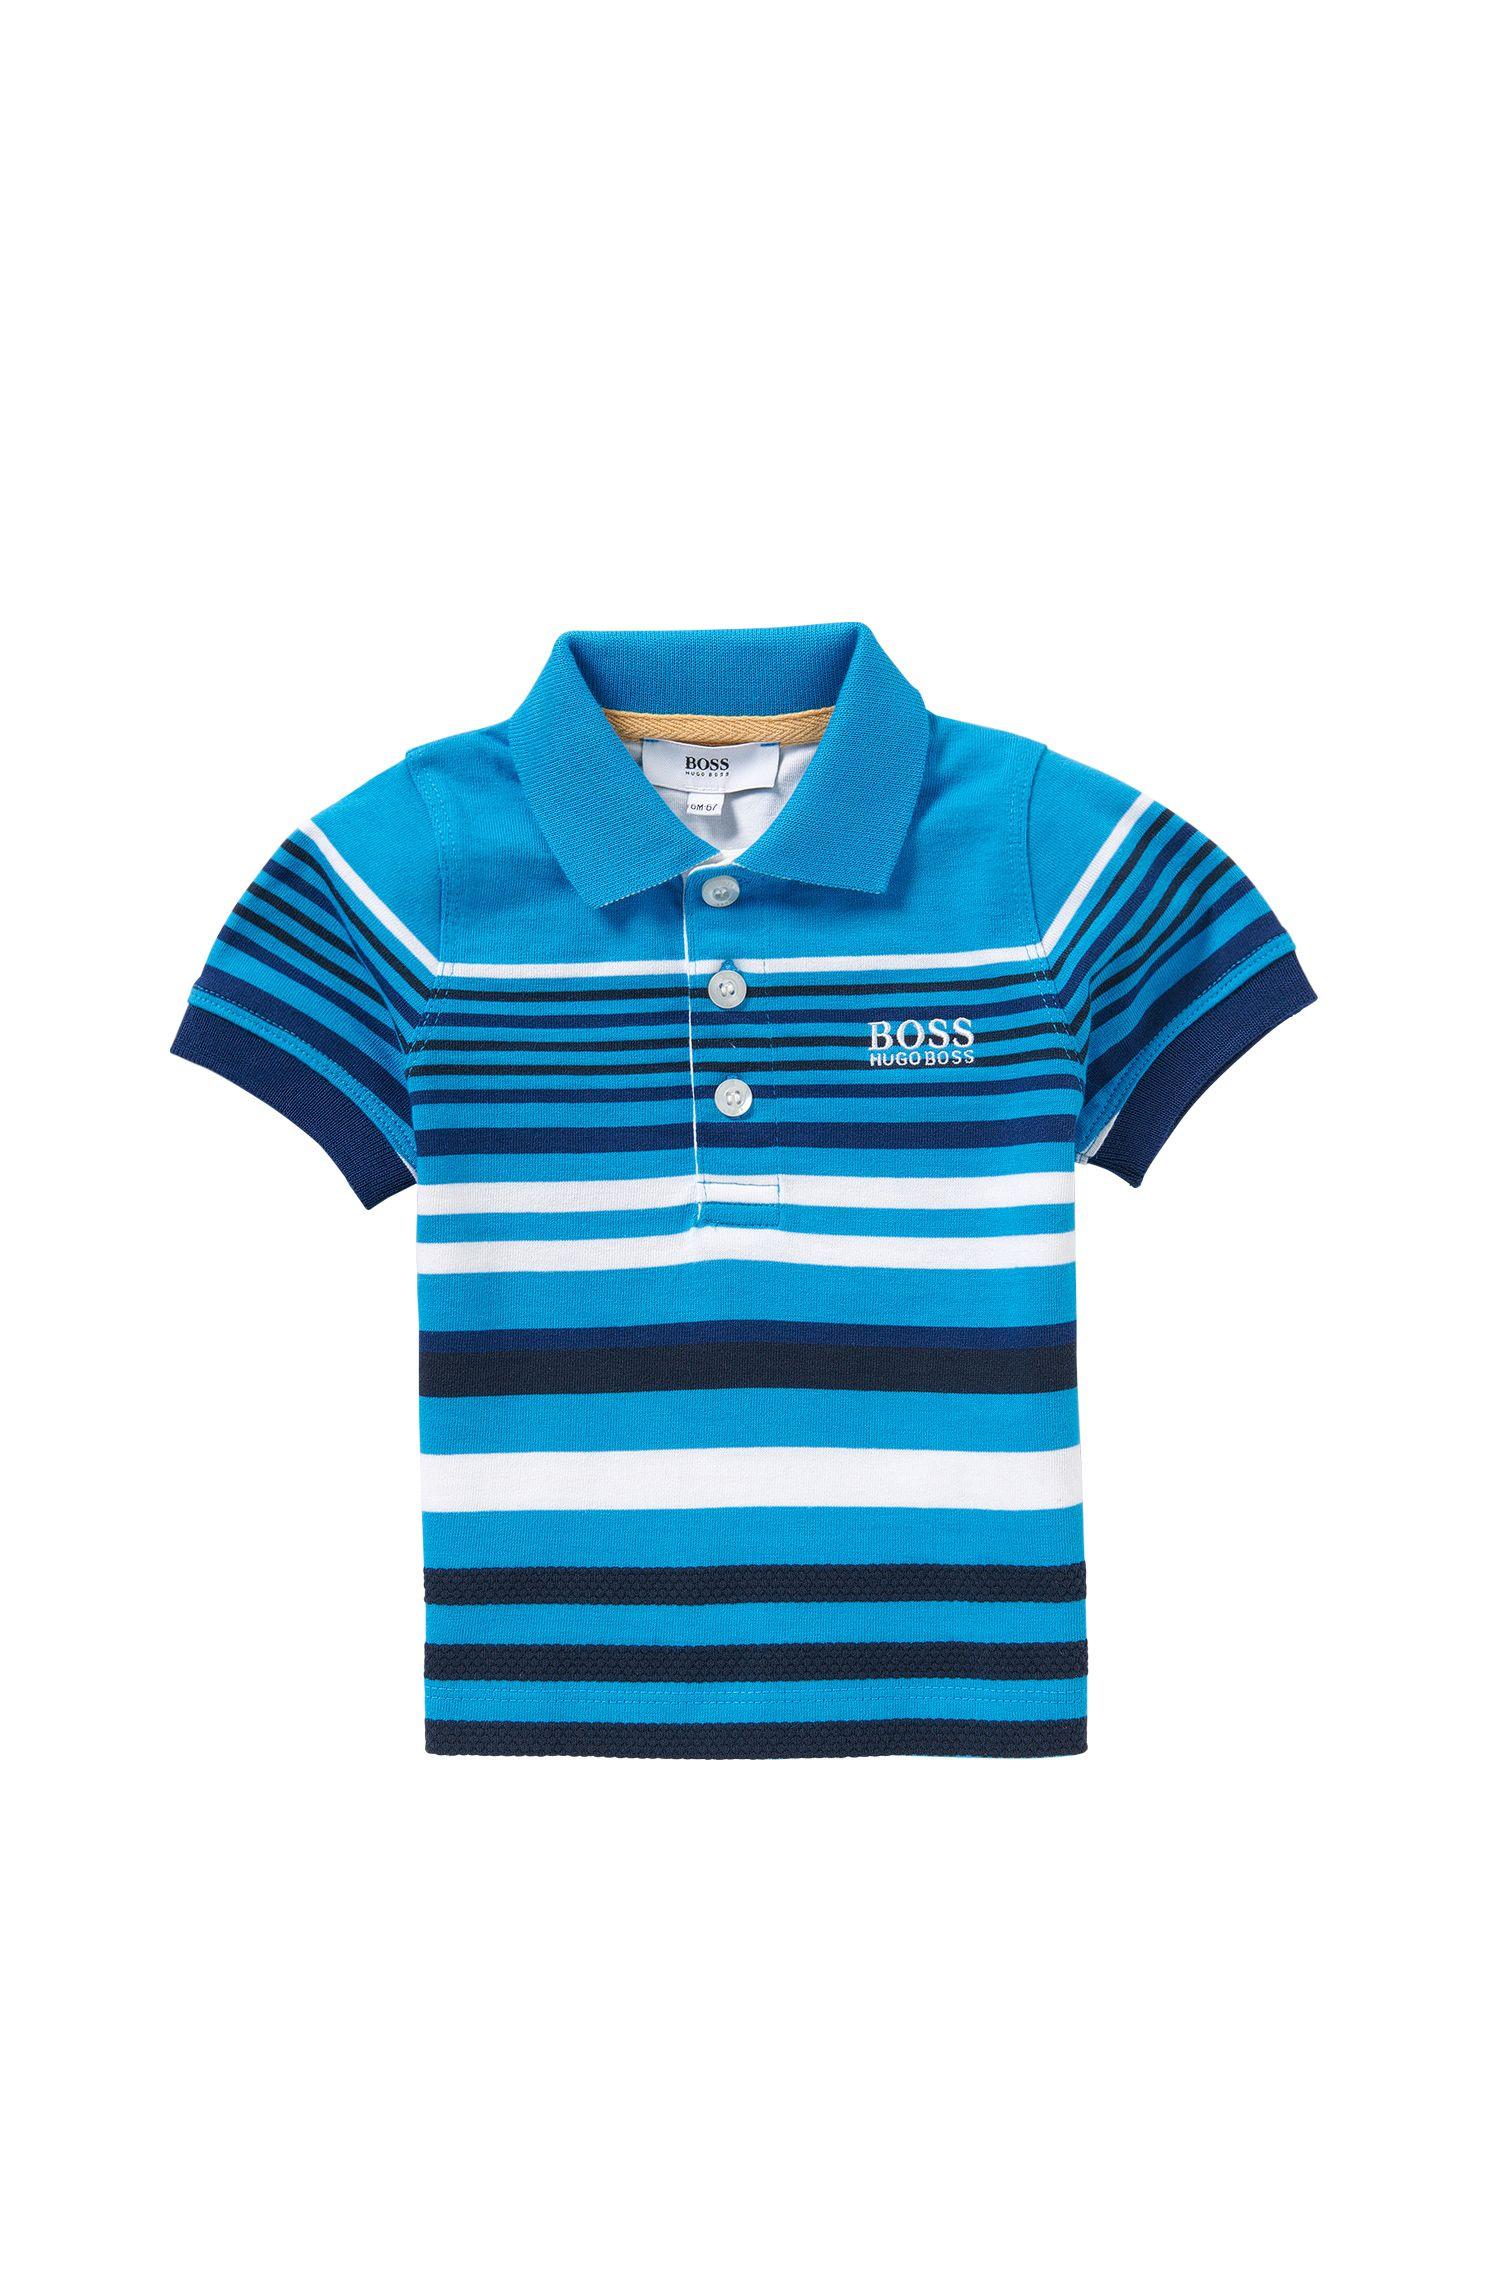 'J05444' | Toddler Stretch Cotton Striped Polo Shirt